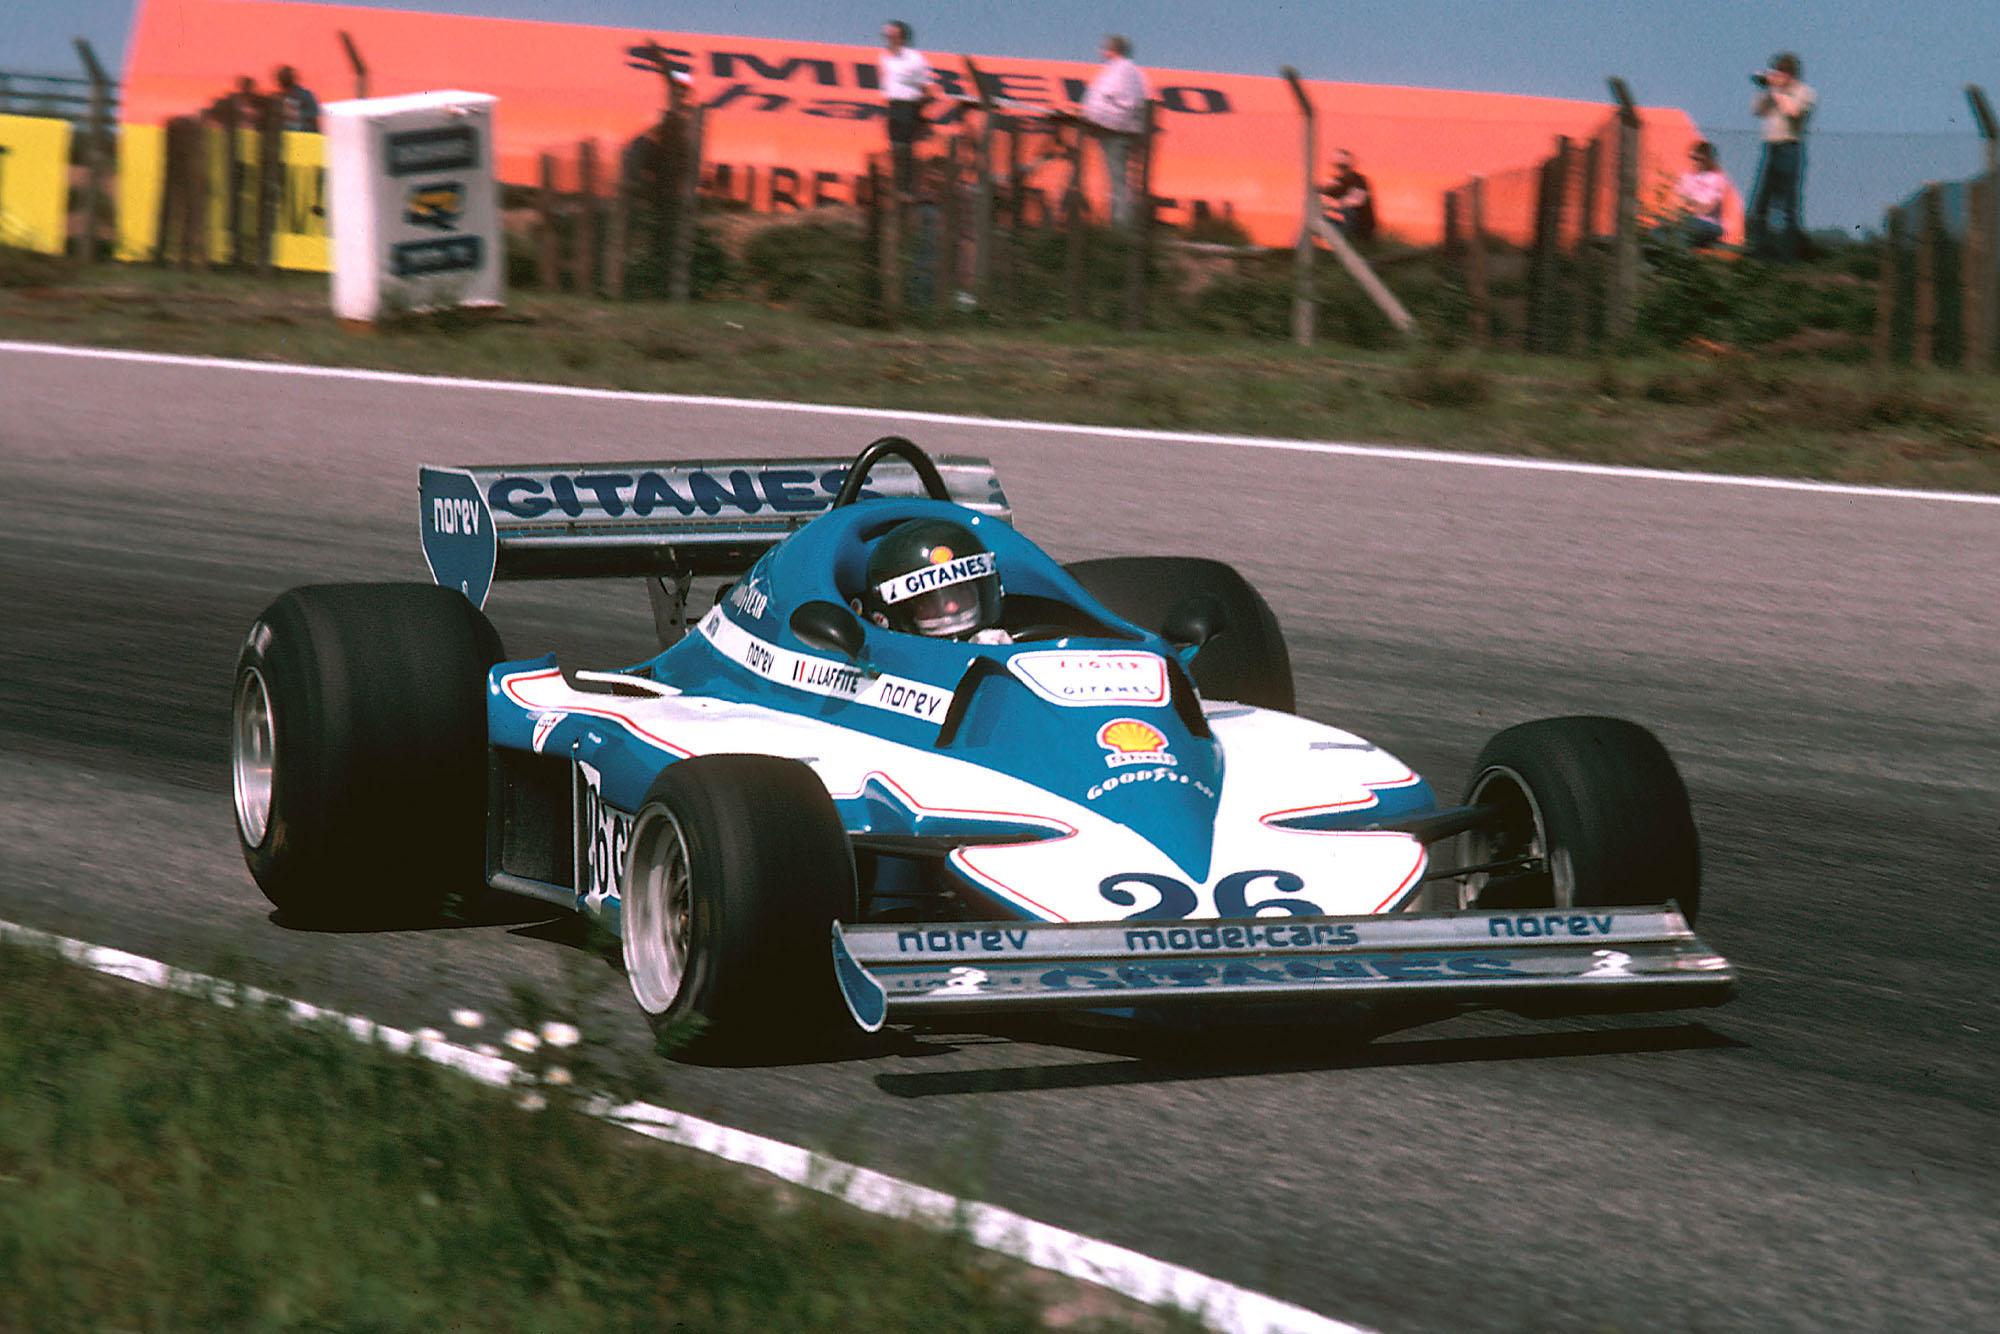 Jacques Laffite (Ligier) at the 1977 Swedish Grand Prix, Anderstorp.